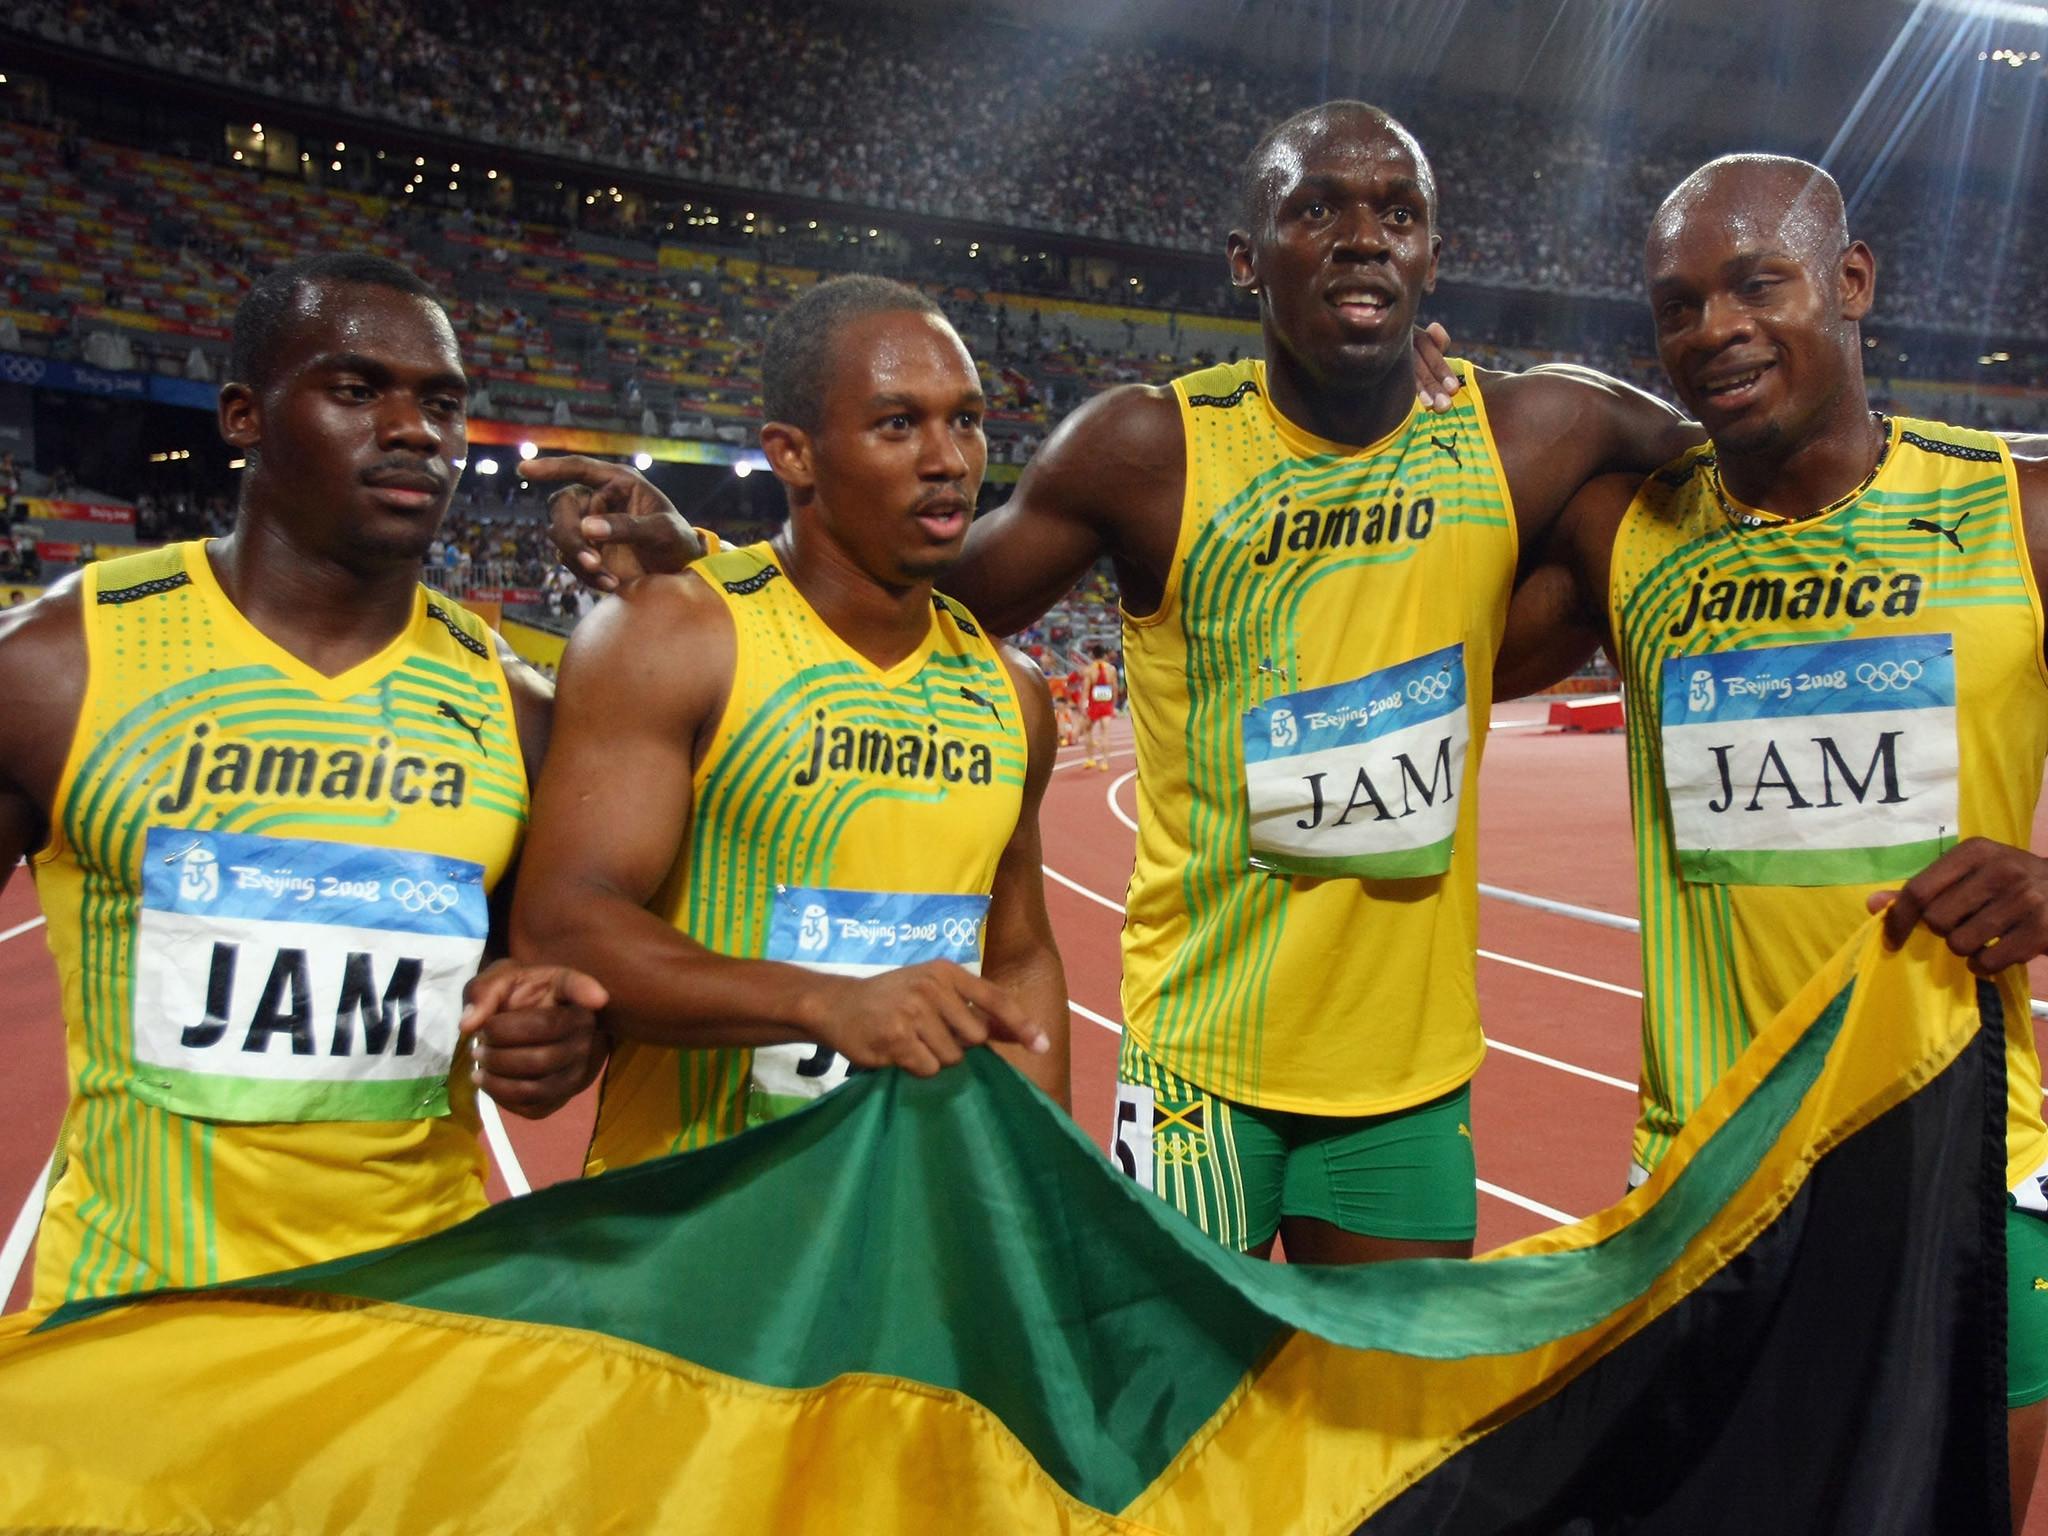 Usain Bolt Wallpaper 2018 Olympics (76+ images)